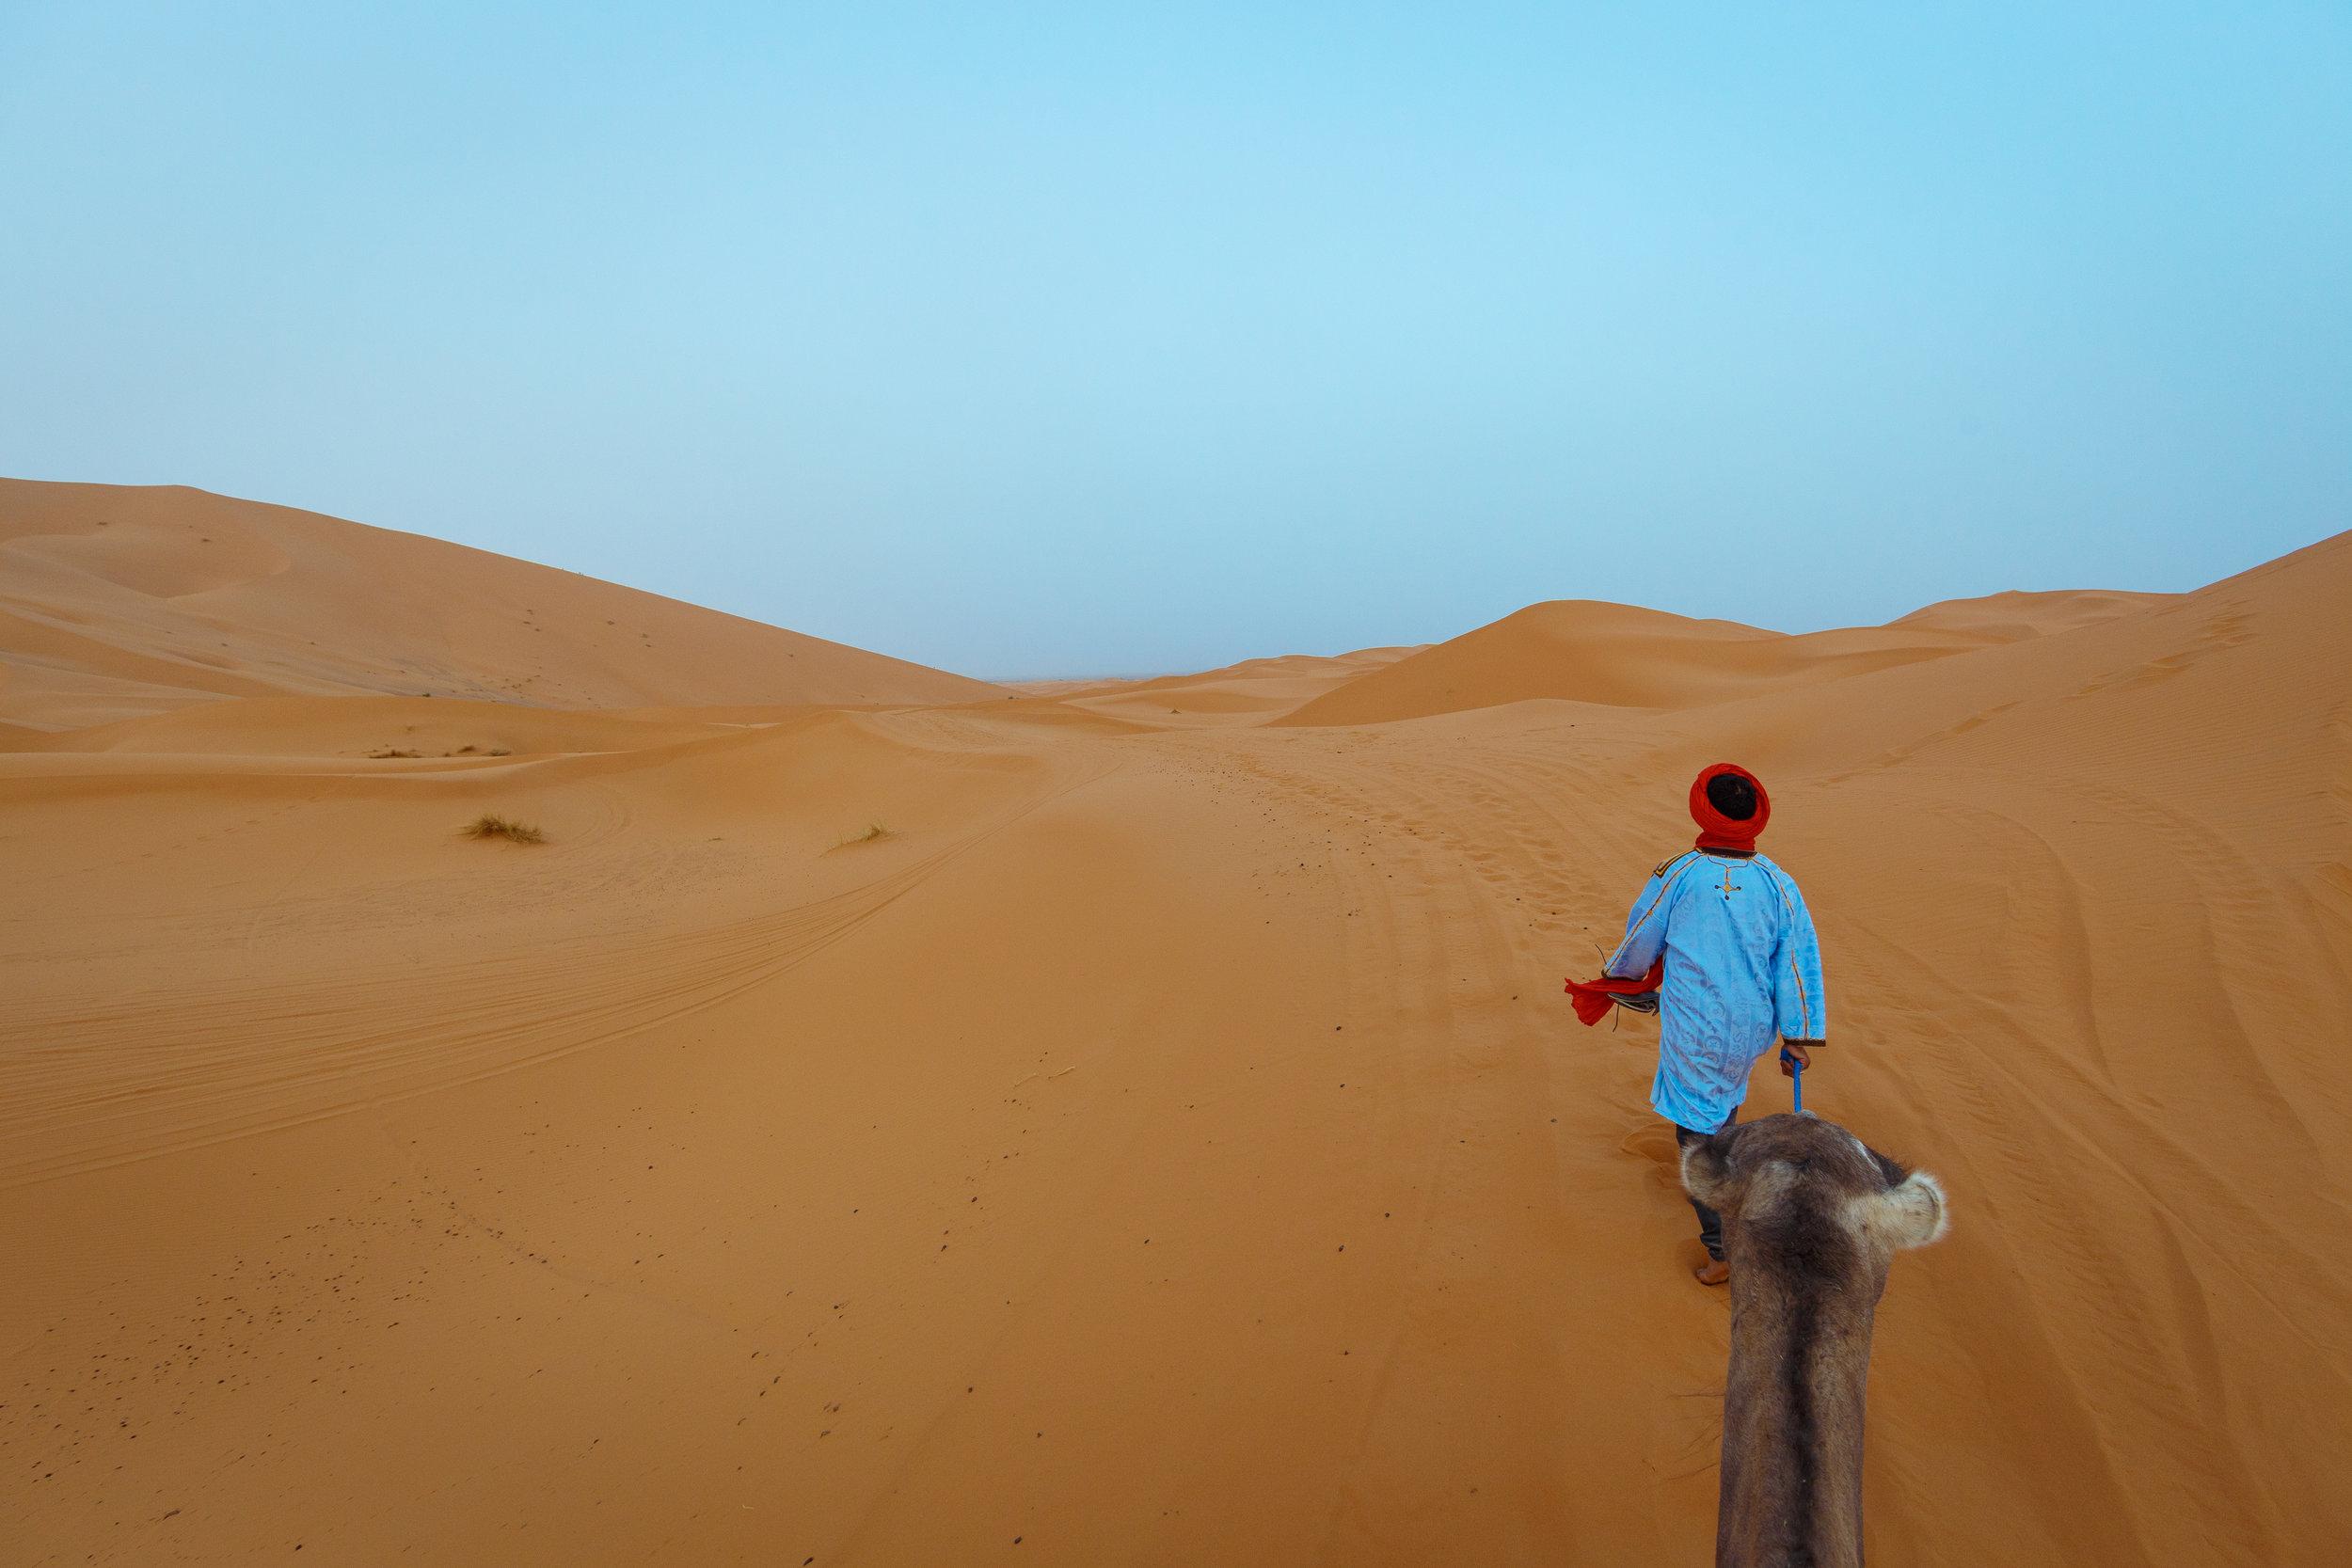 Camel trekking into the Sahara Desert.